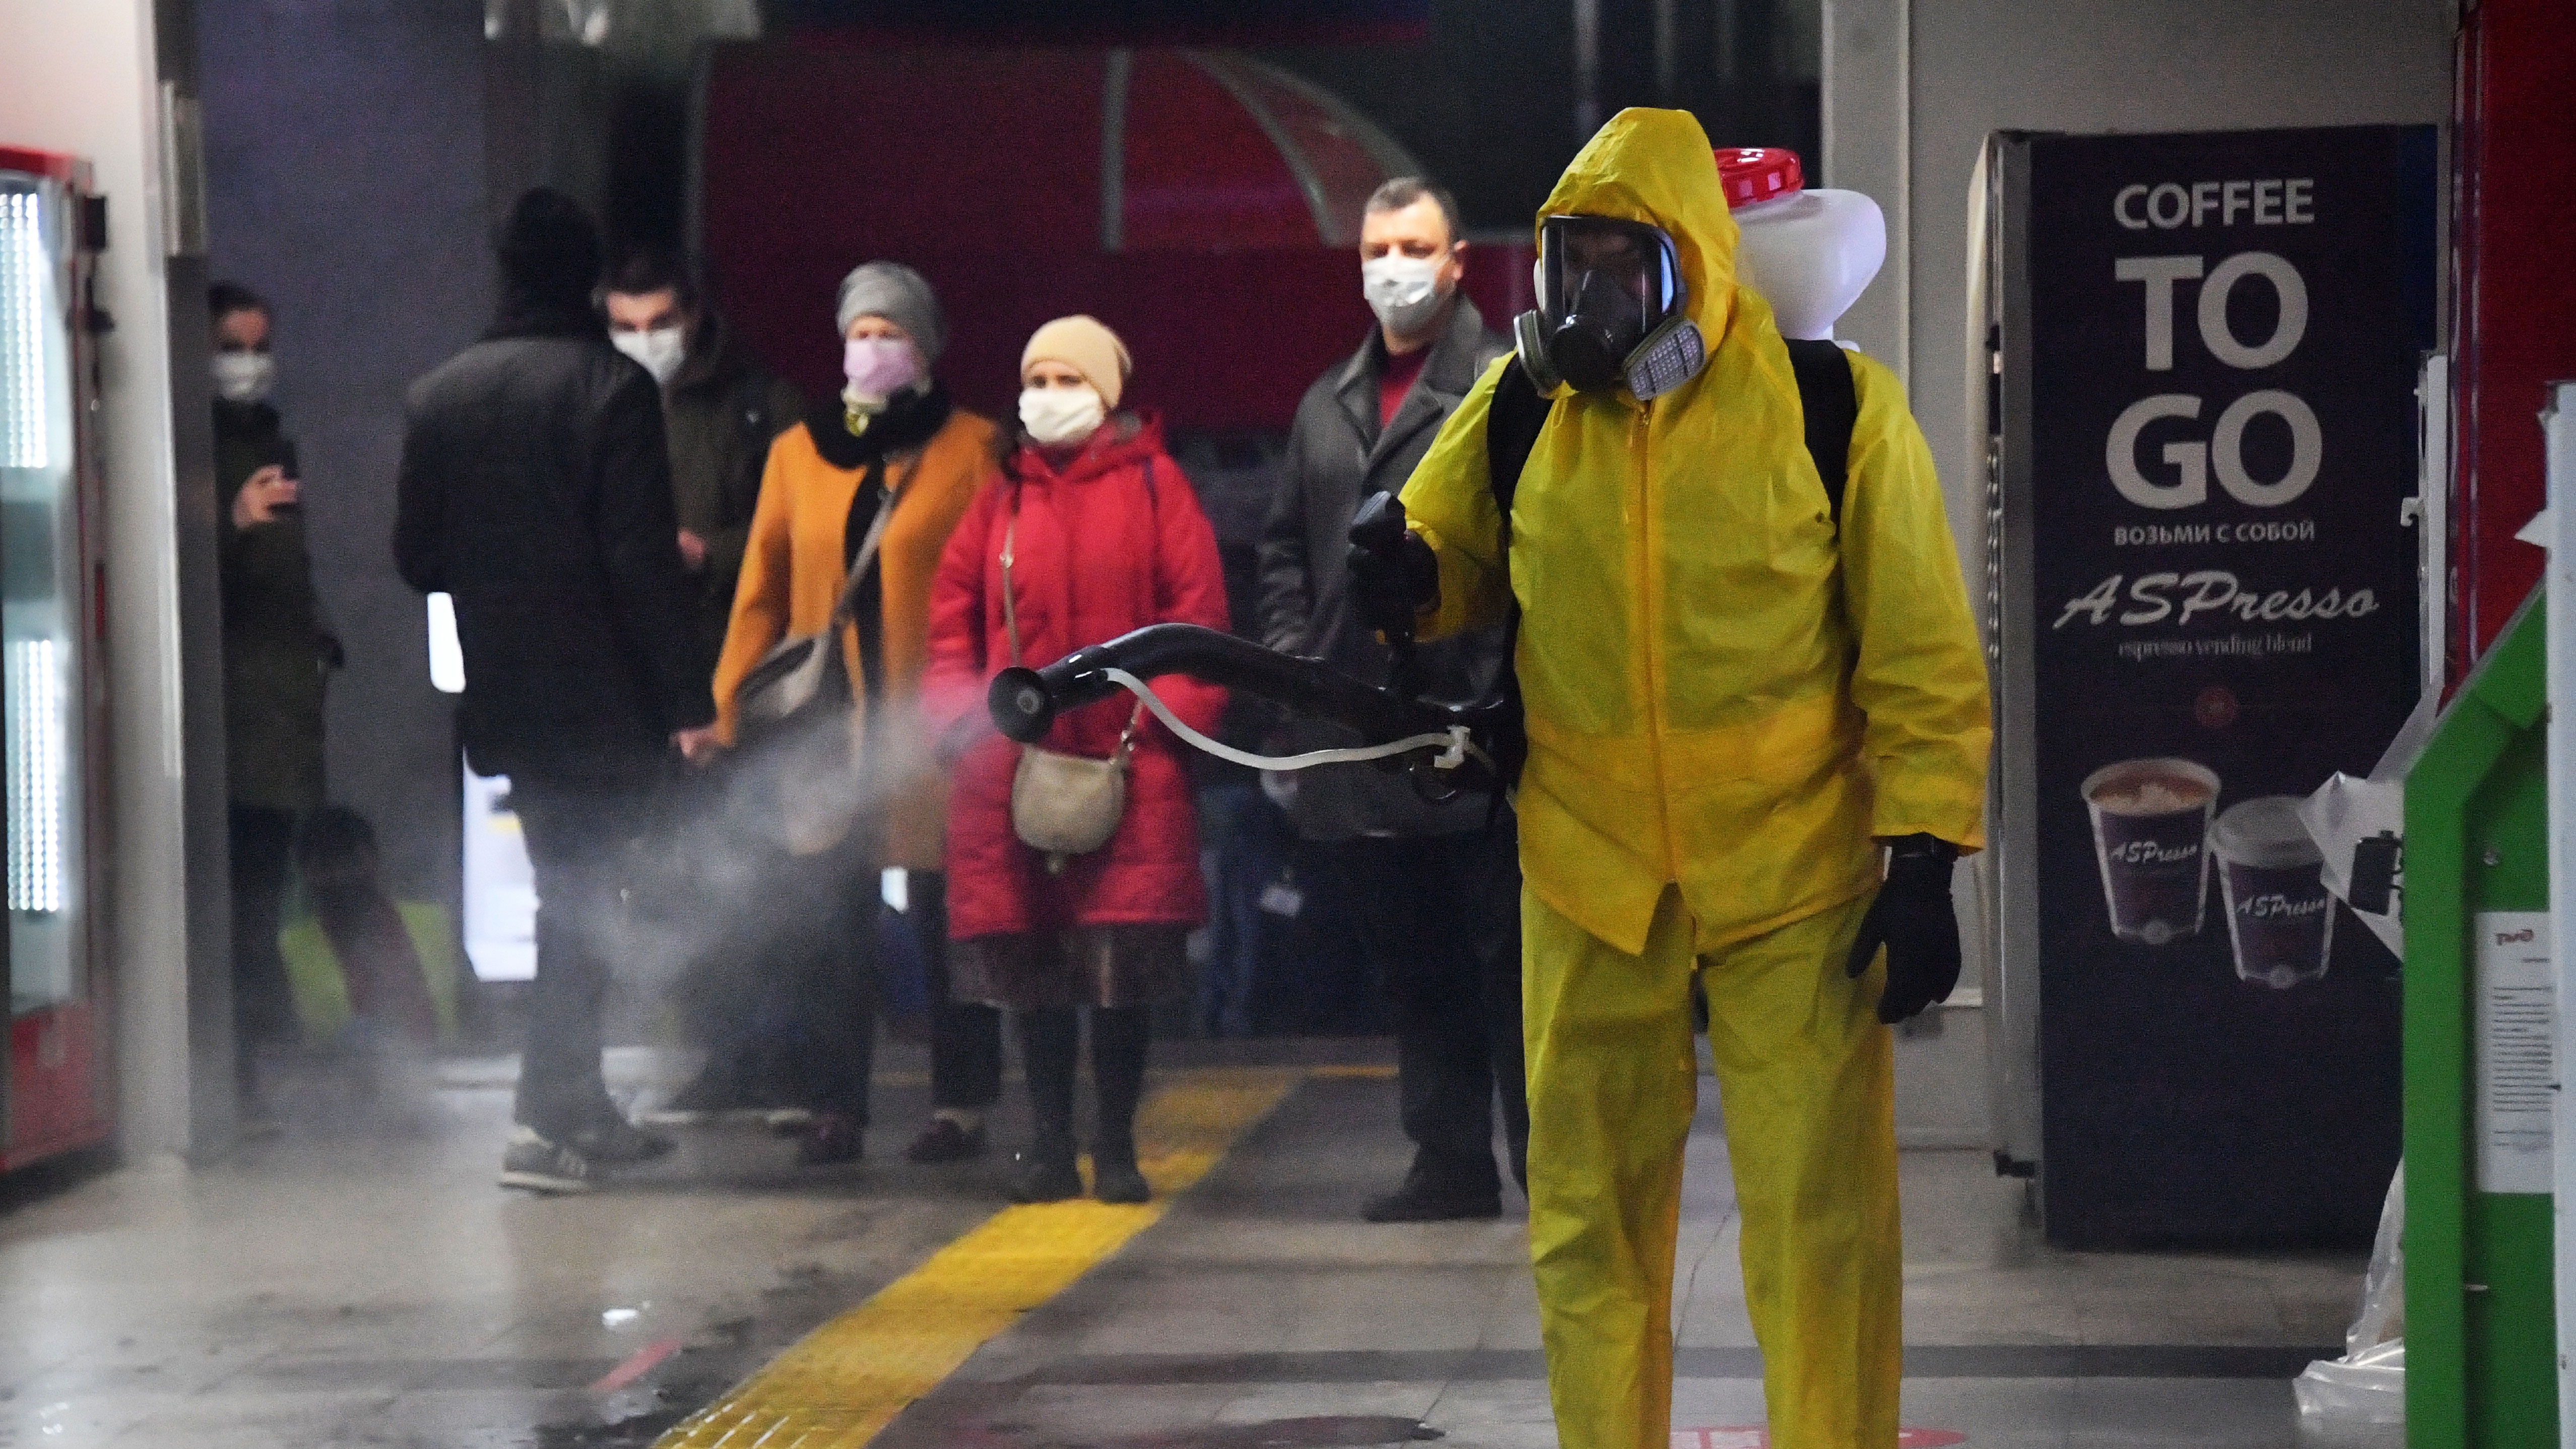 В Пскове смягчат ограничения из-за коронавируса